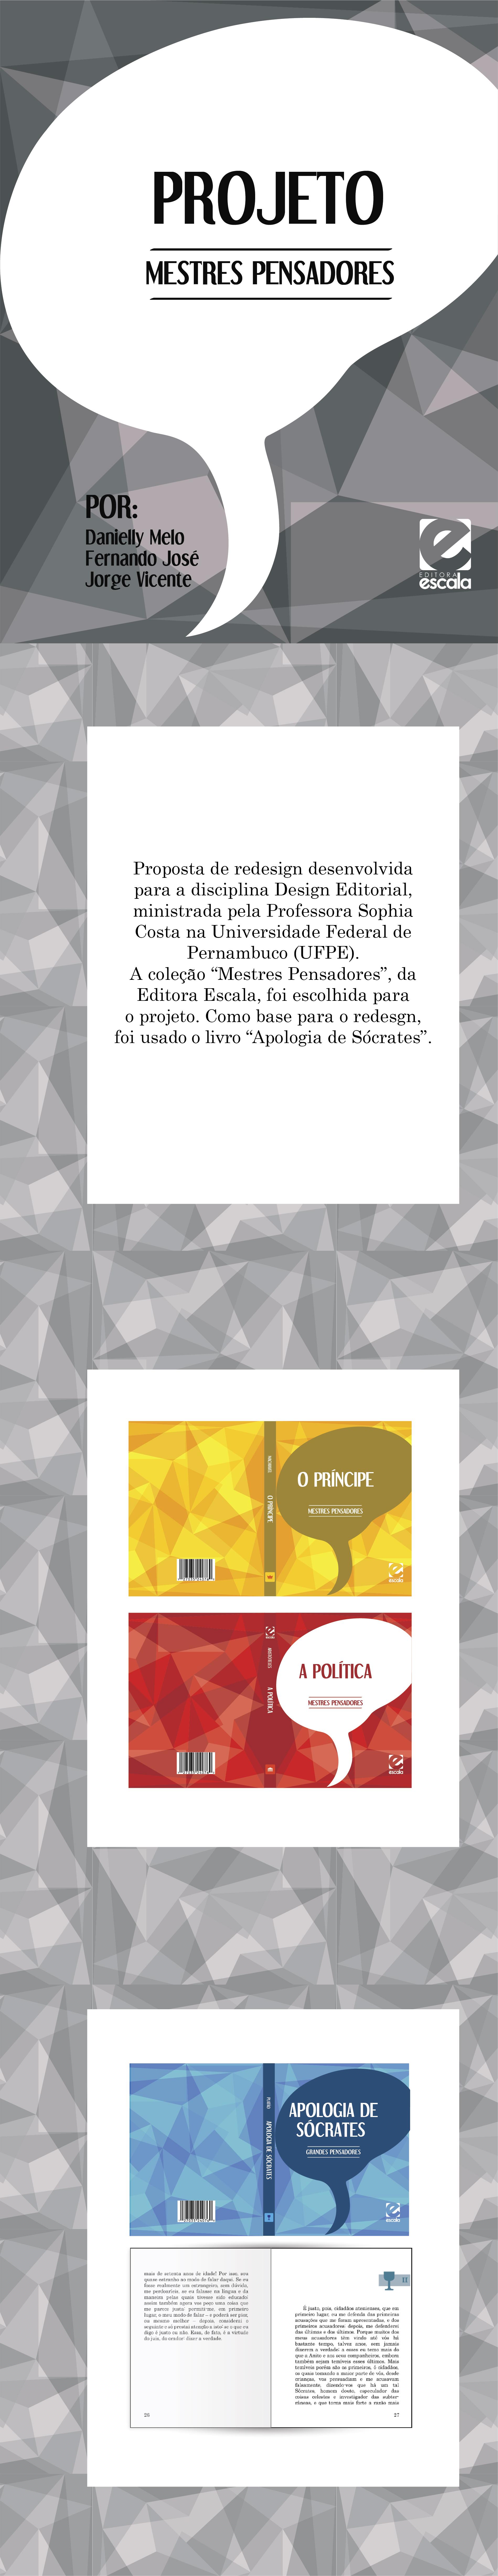 Projeto desenvlvido para a disciplina Design Editorial, ministrada pela professora Sophia Costa, na Universidade federal de Pernambuco (UFPE - CAA).